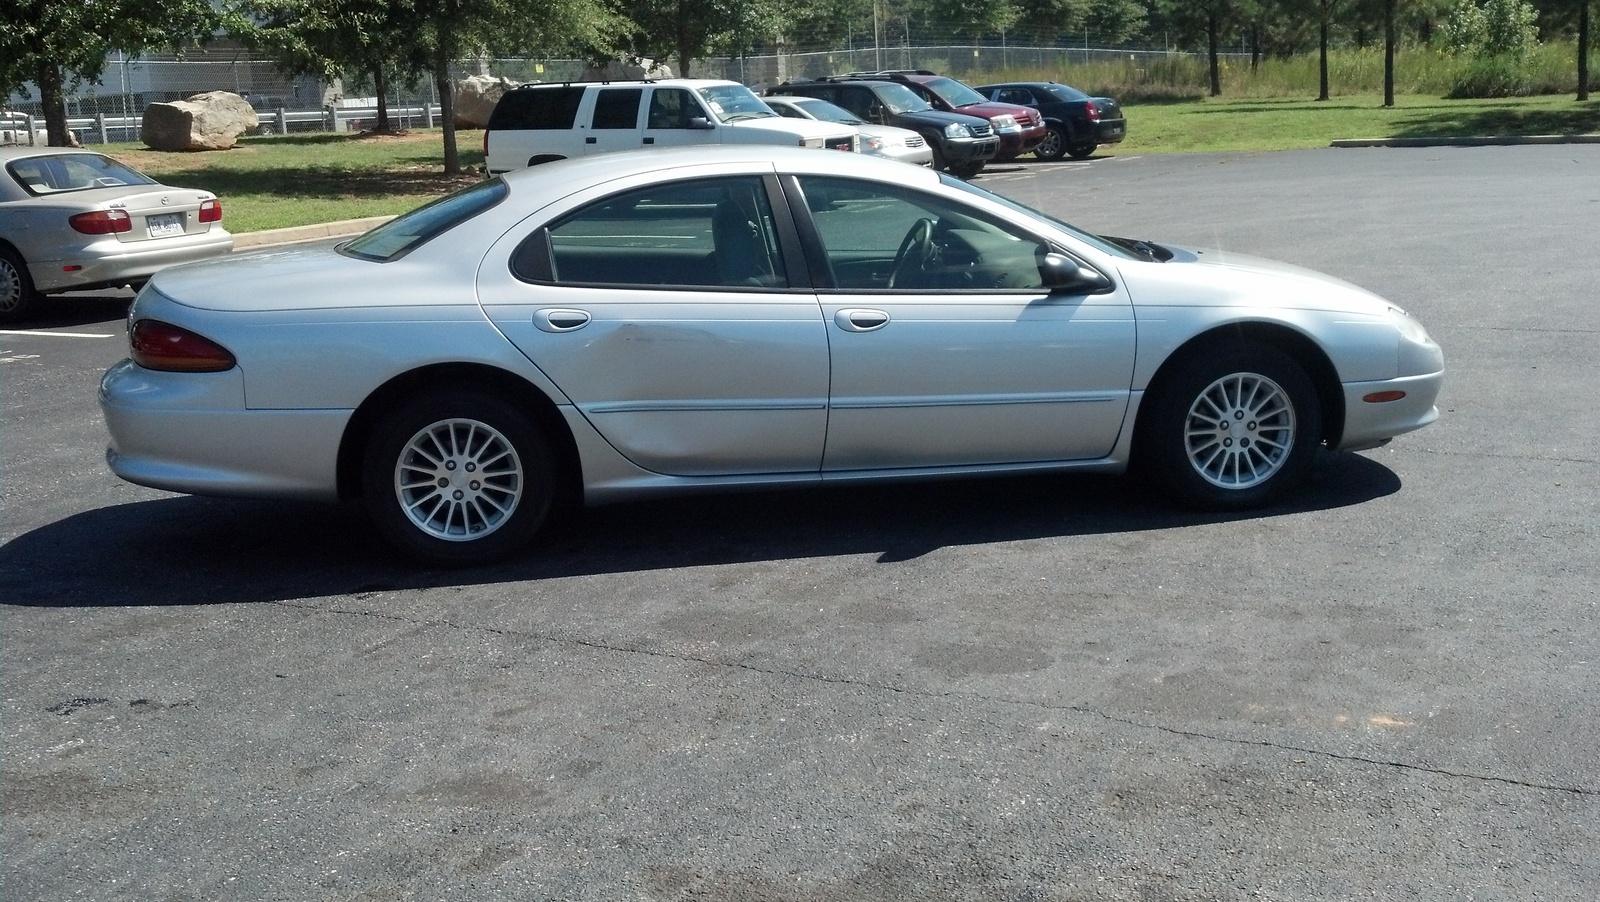 2002 Chrysler Concorde Lx Mpg